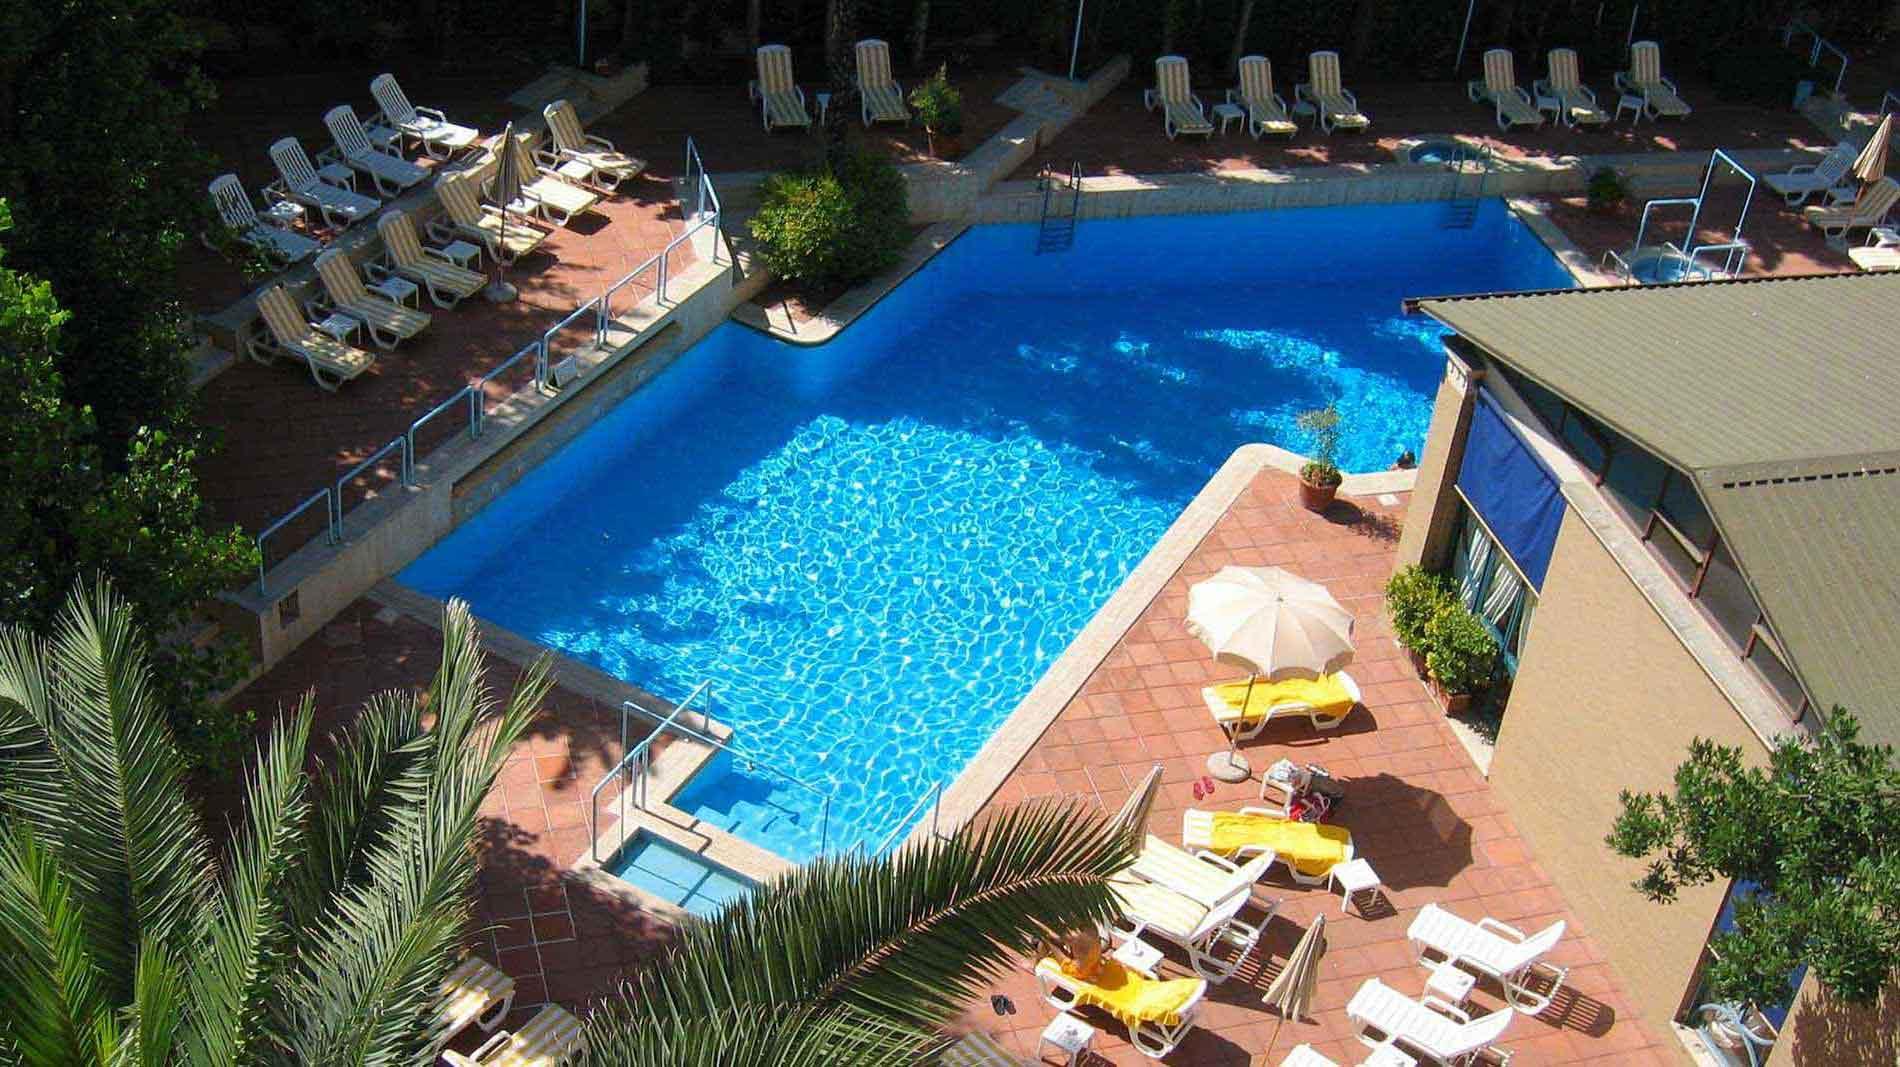 Hotel con piscina roma - Hotel piscina roma ...